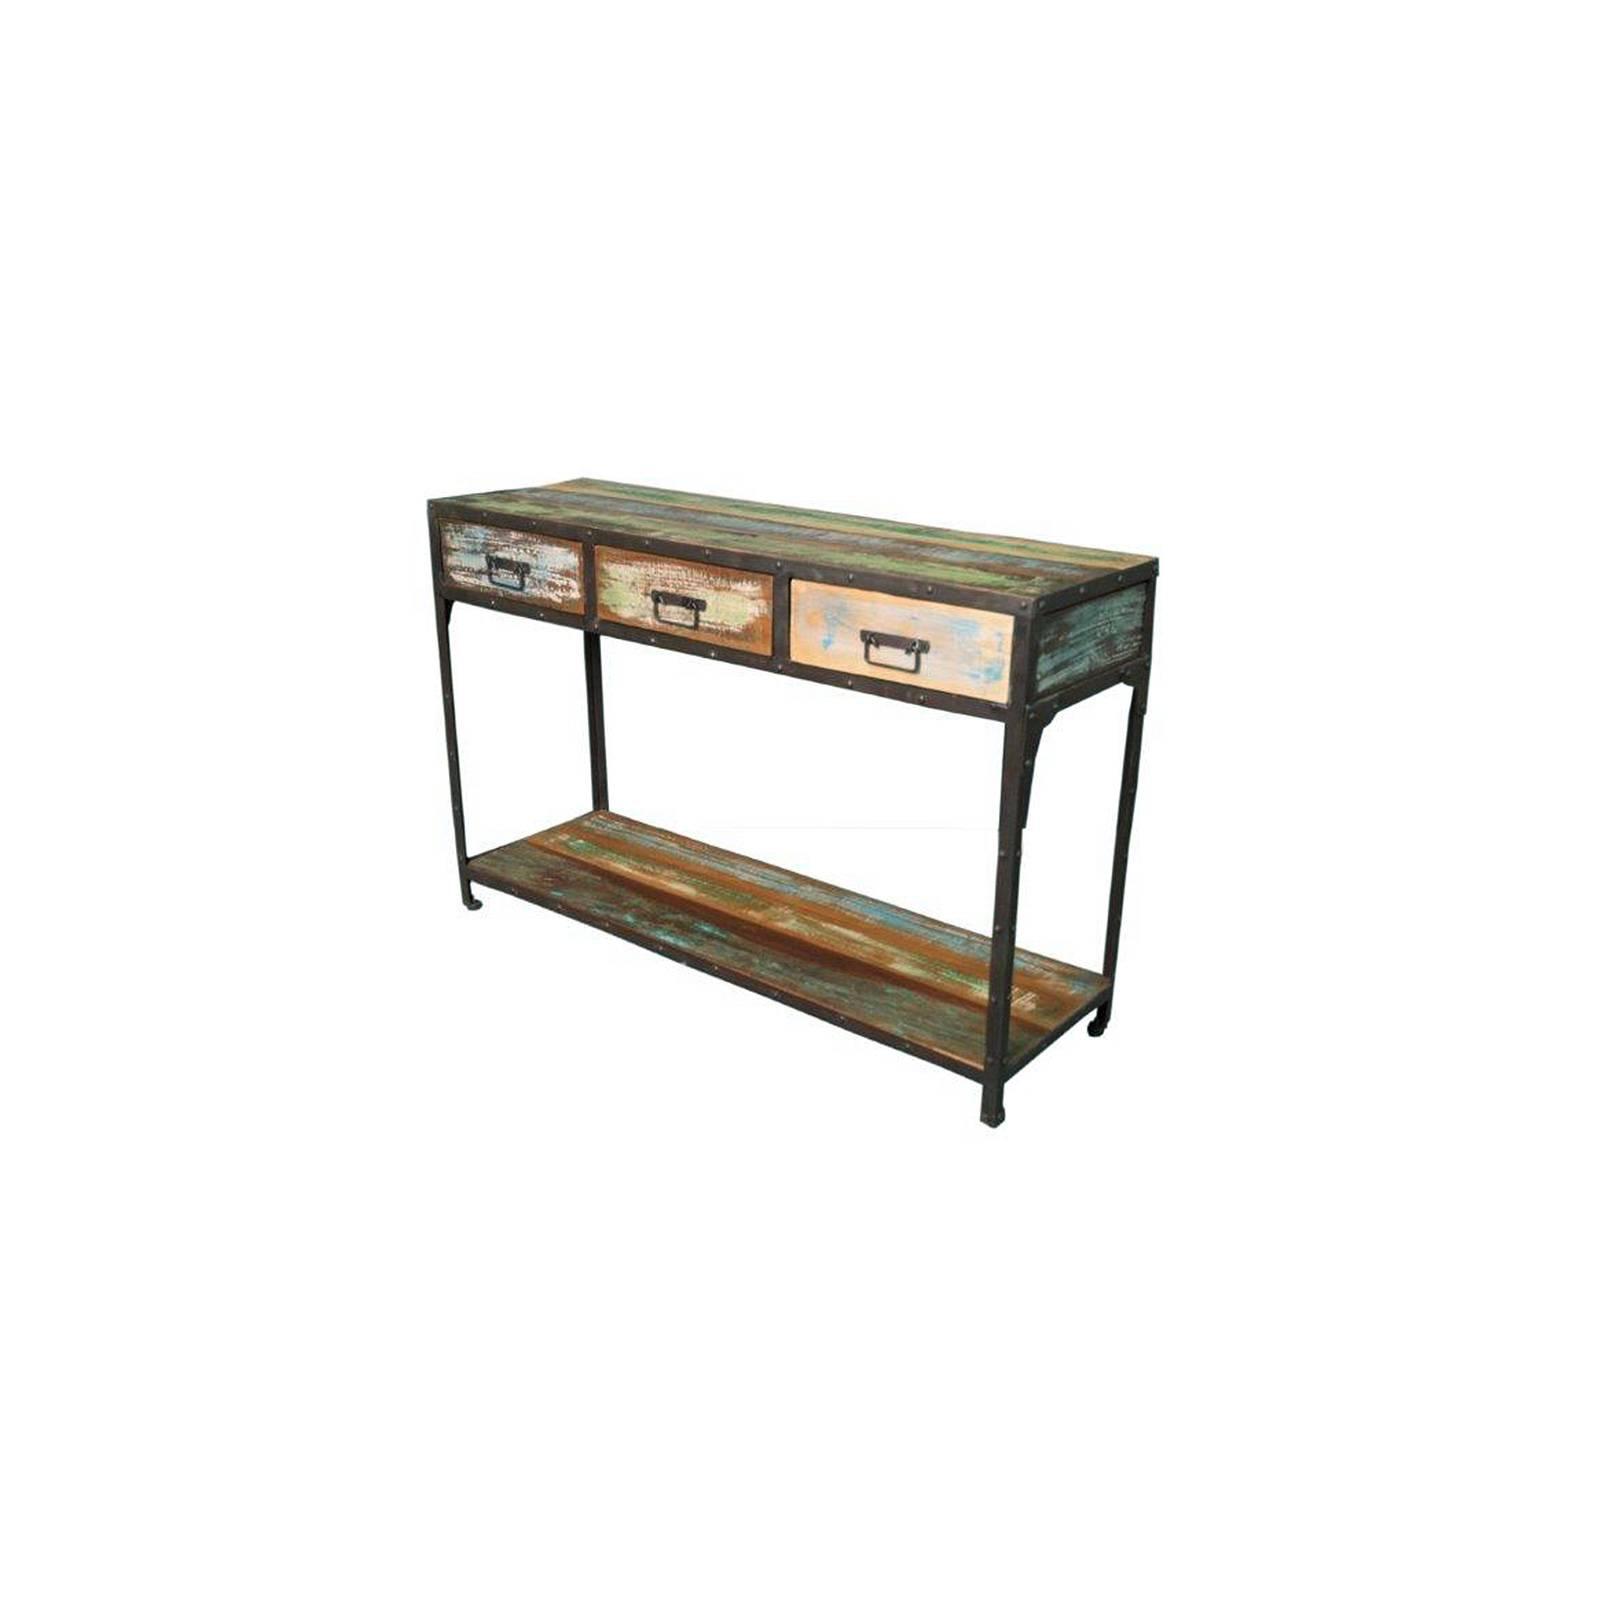 console en fer forg et palissandre entr e industriel loft. Black Bedroom Furniture Sets. Home Design Ideas